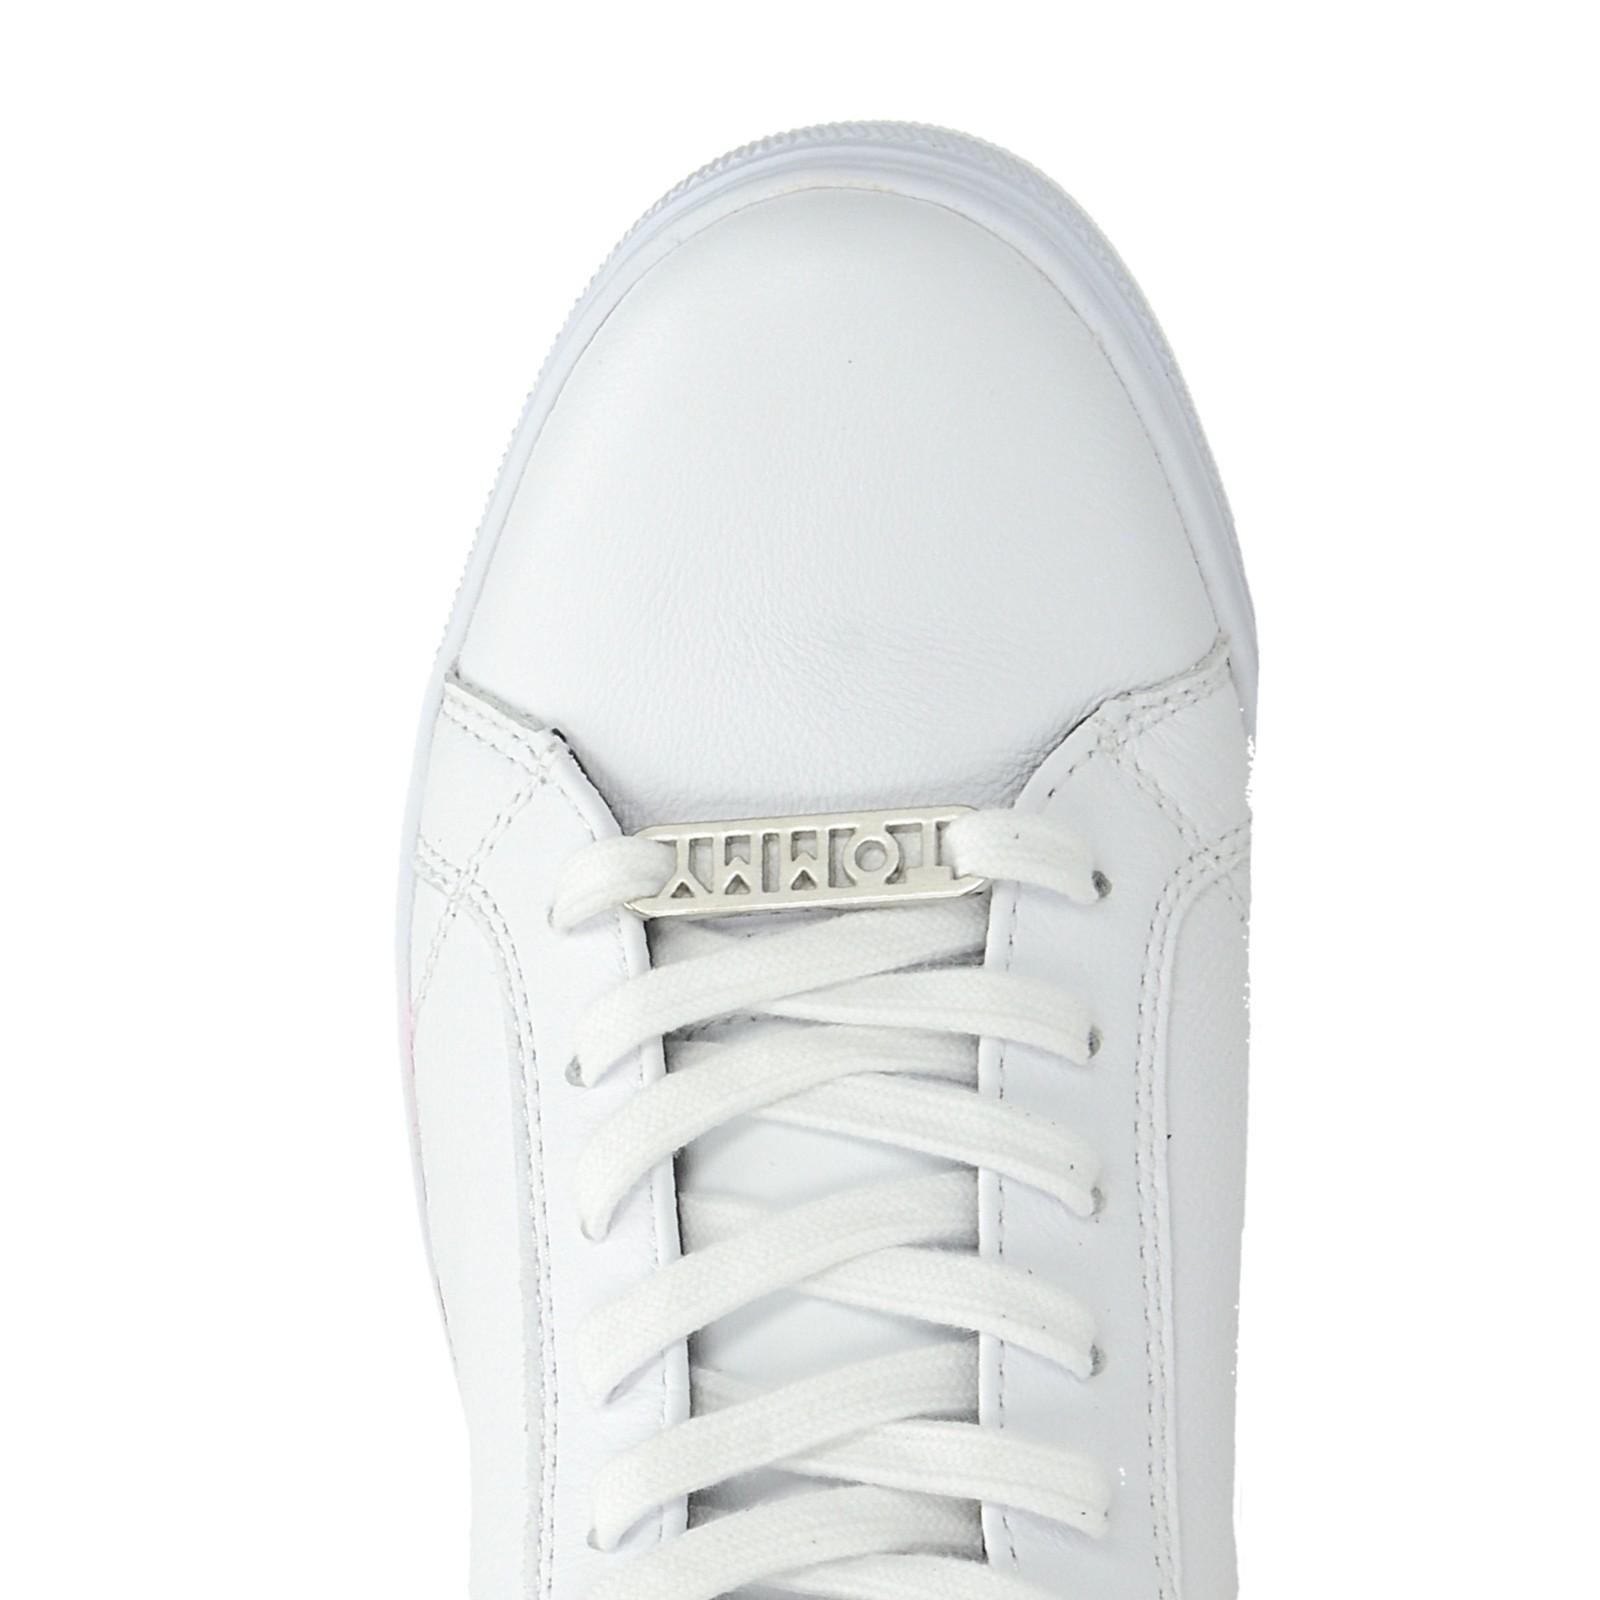 9287bd01d892a Tommy Hilfiger dámske štýlové tenisky - biele | FW0FW03222020-RWB ...